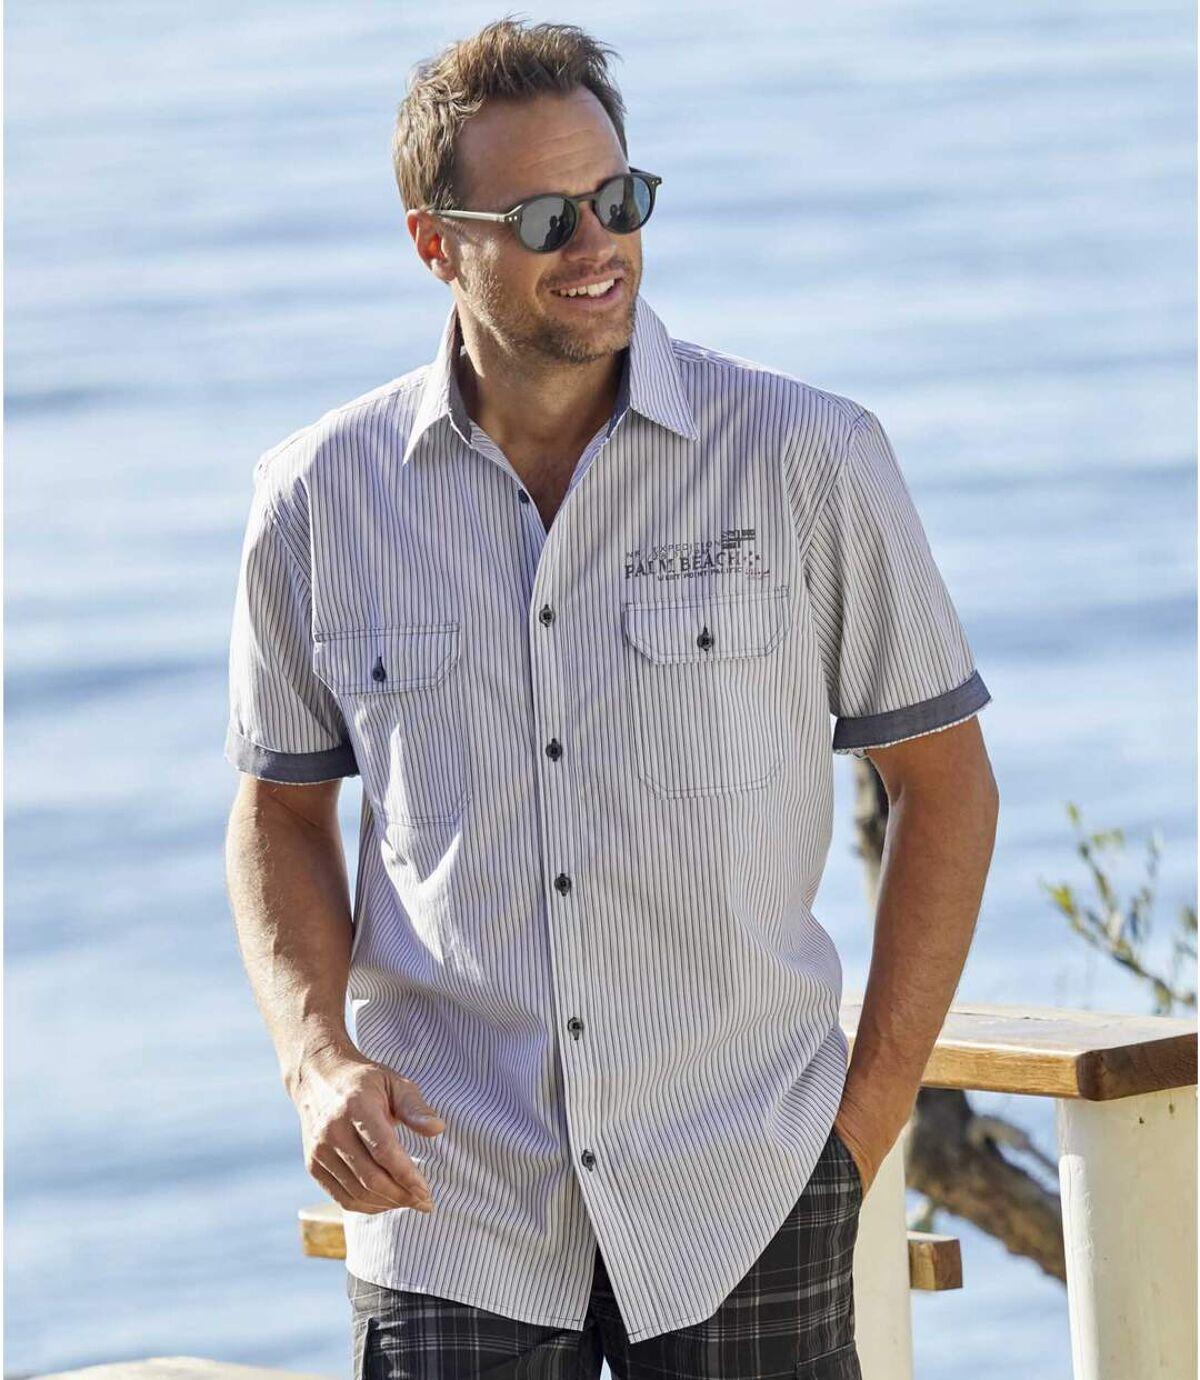 Koszula Tropical Surf Atlas For Men